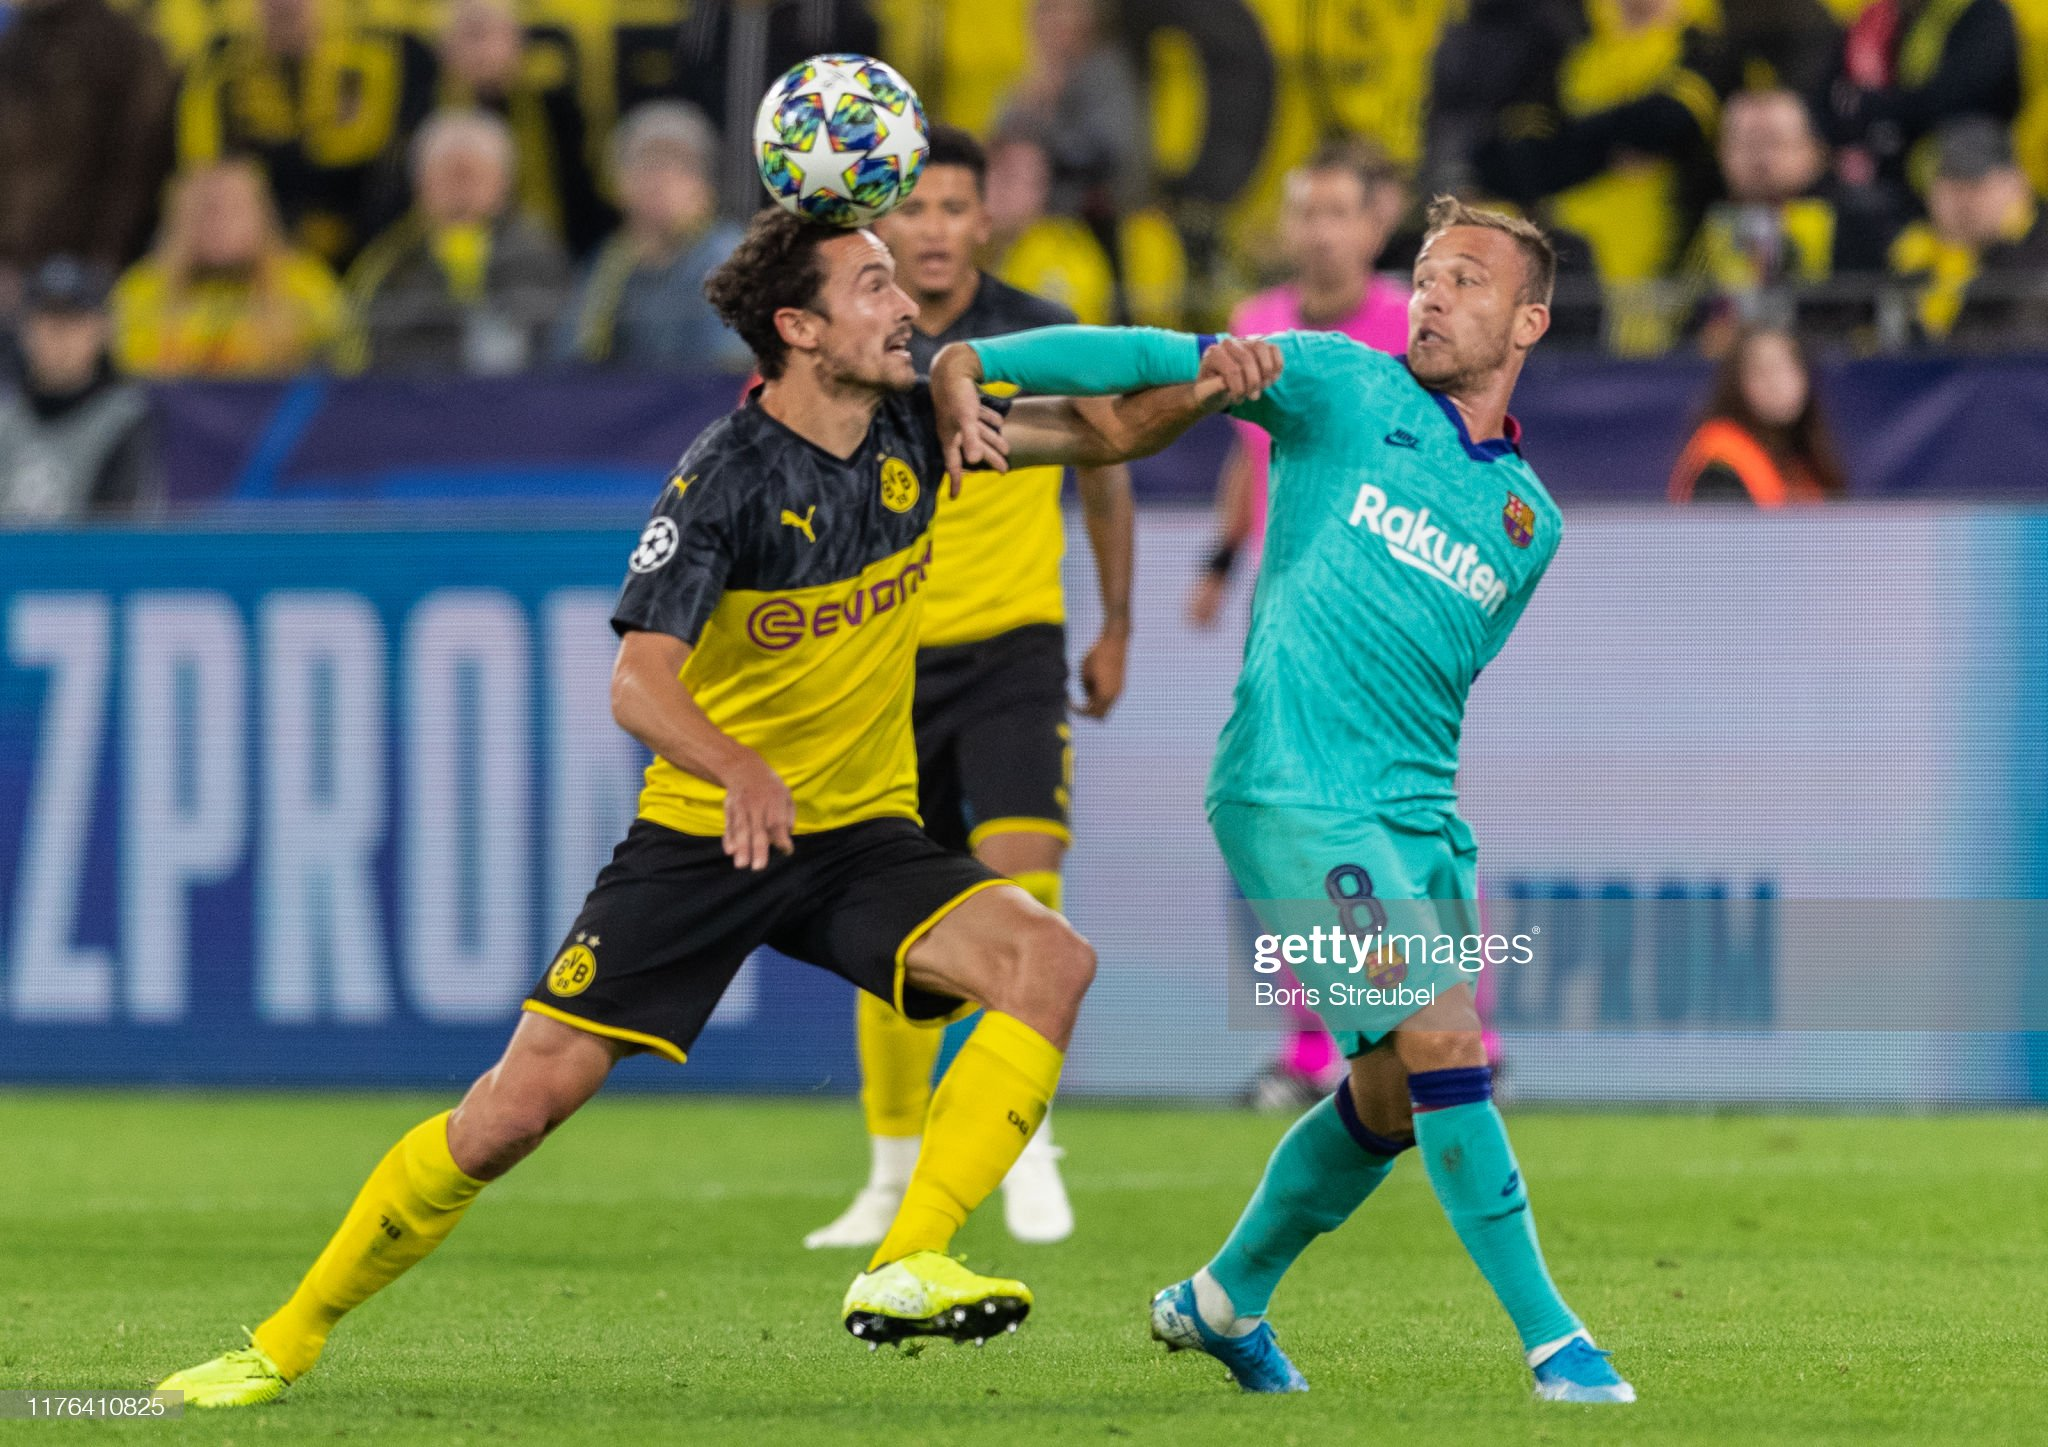 Barcelona v Dortmund preview, prediction and odds